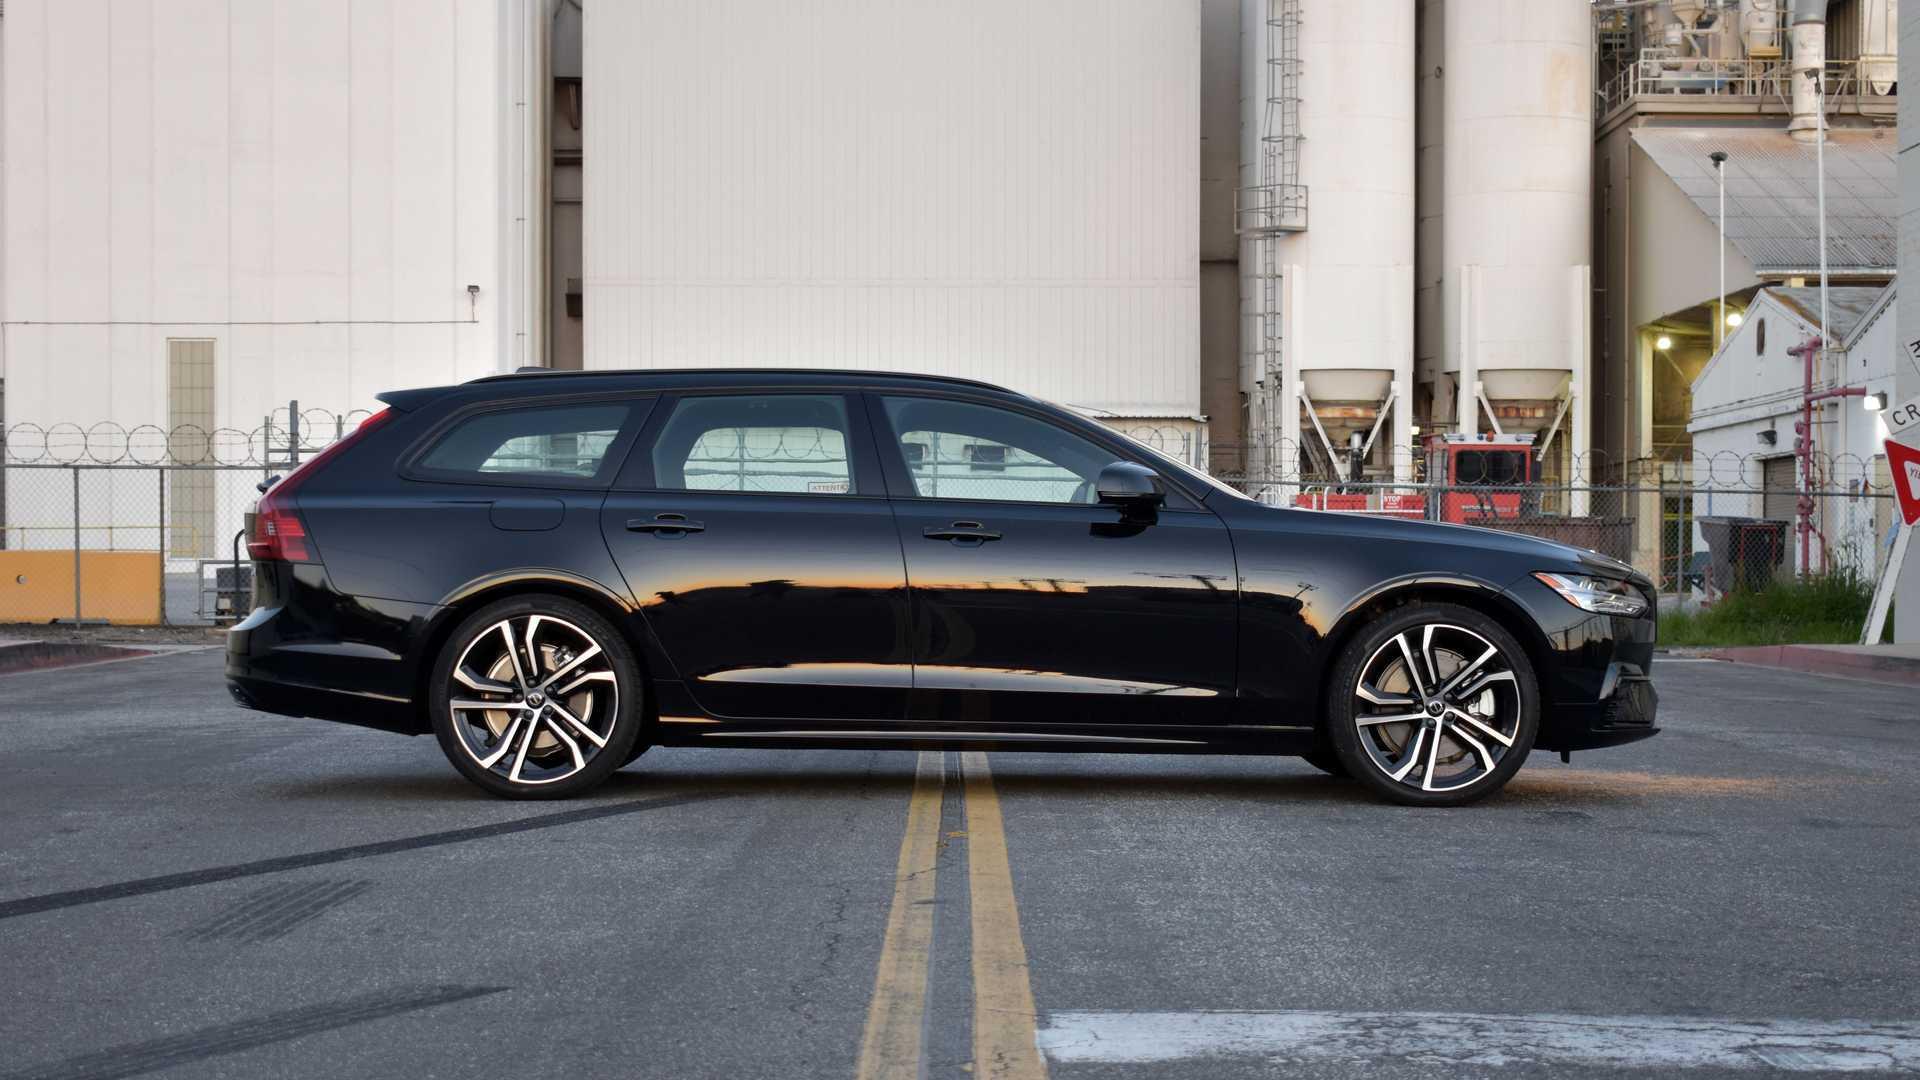 2021-volvo-v90-t6-r-design-awd-exterior-side-profile.jpg